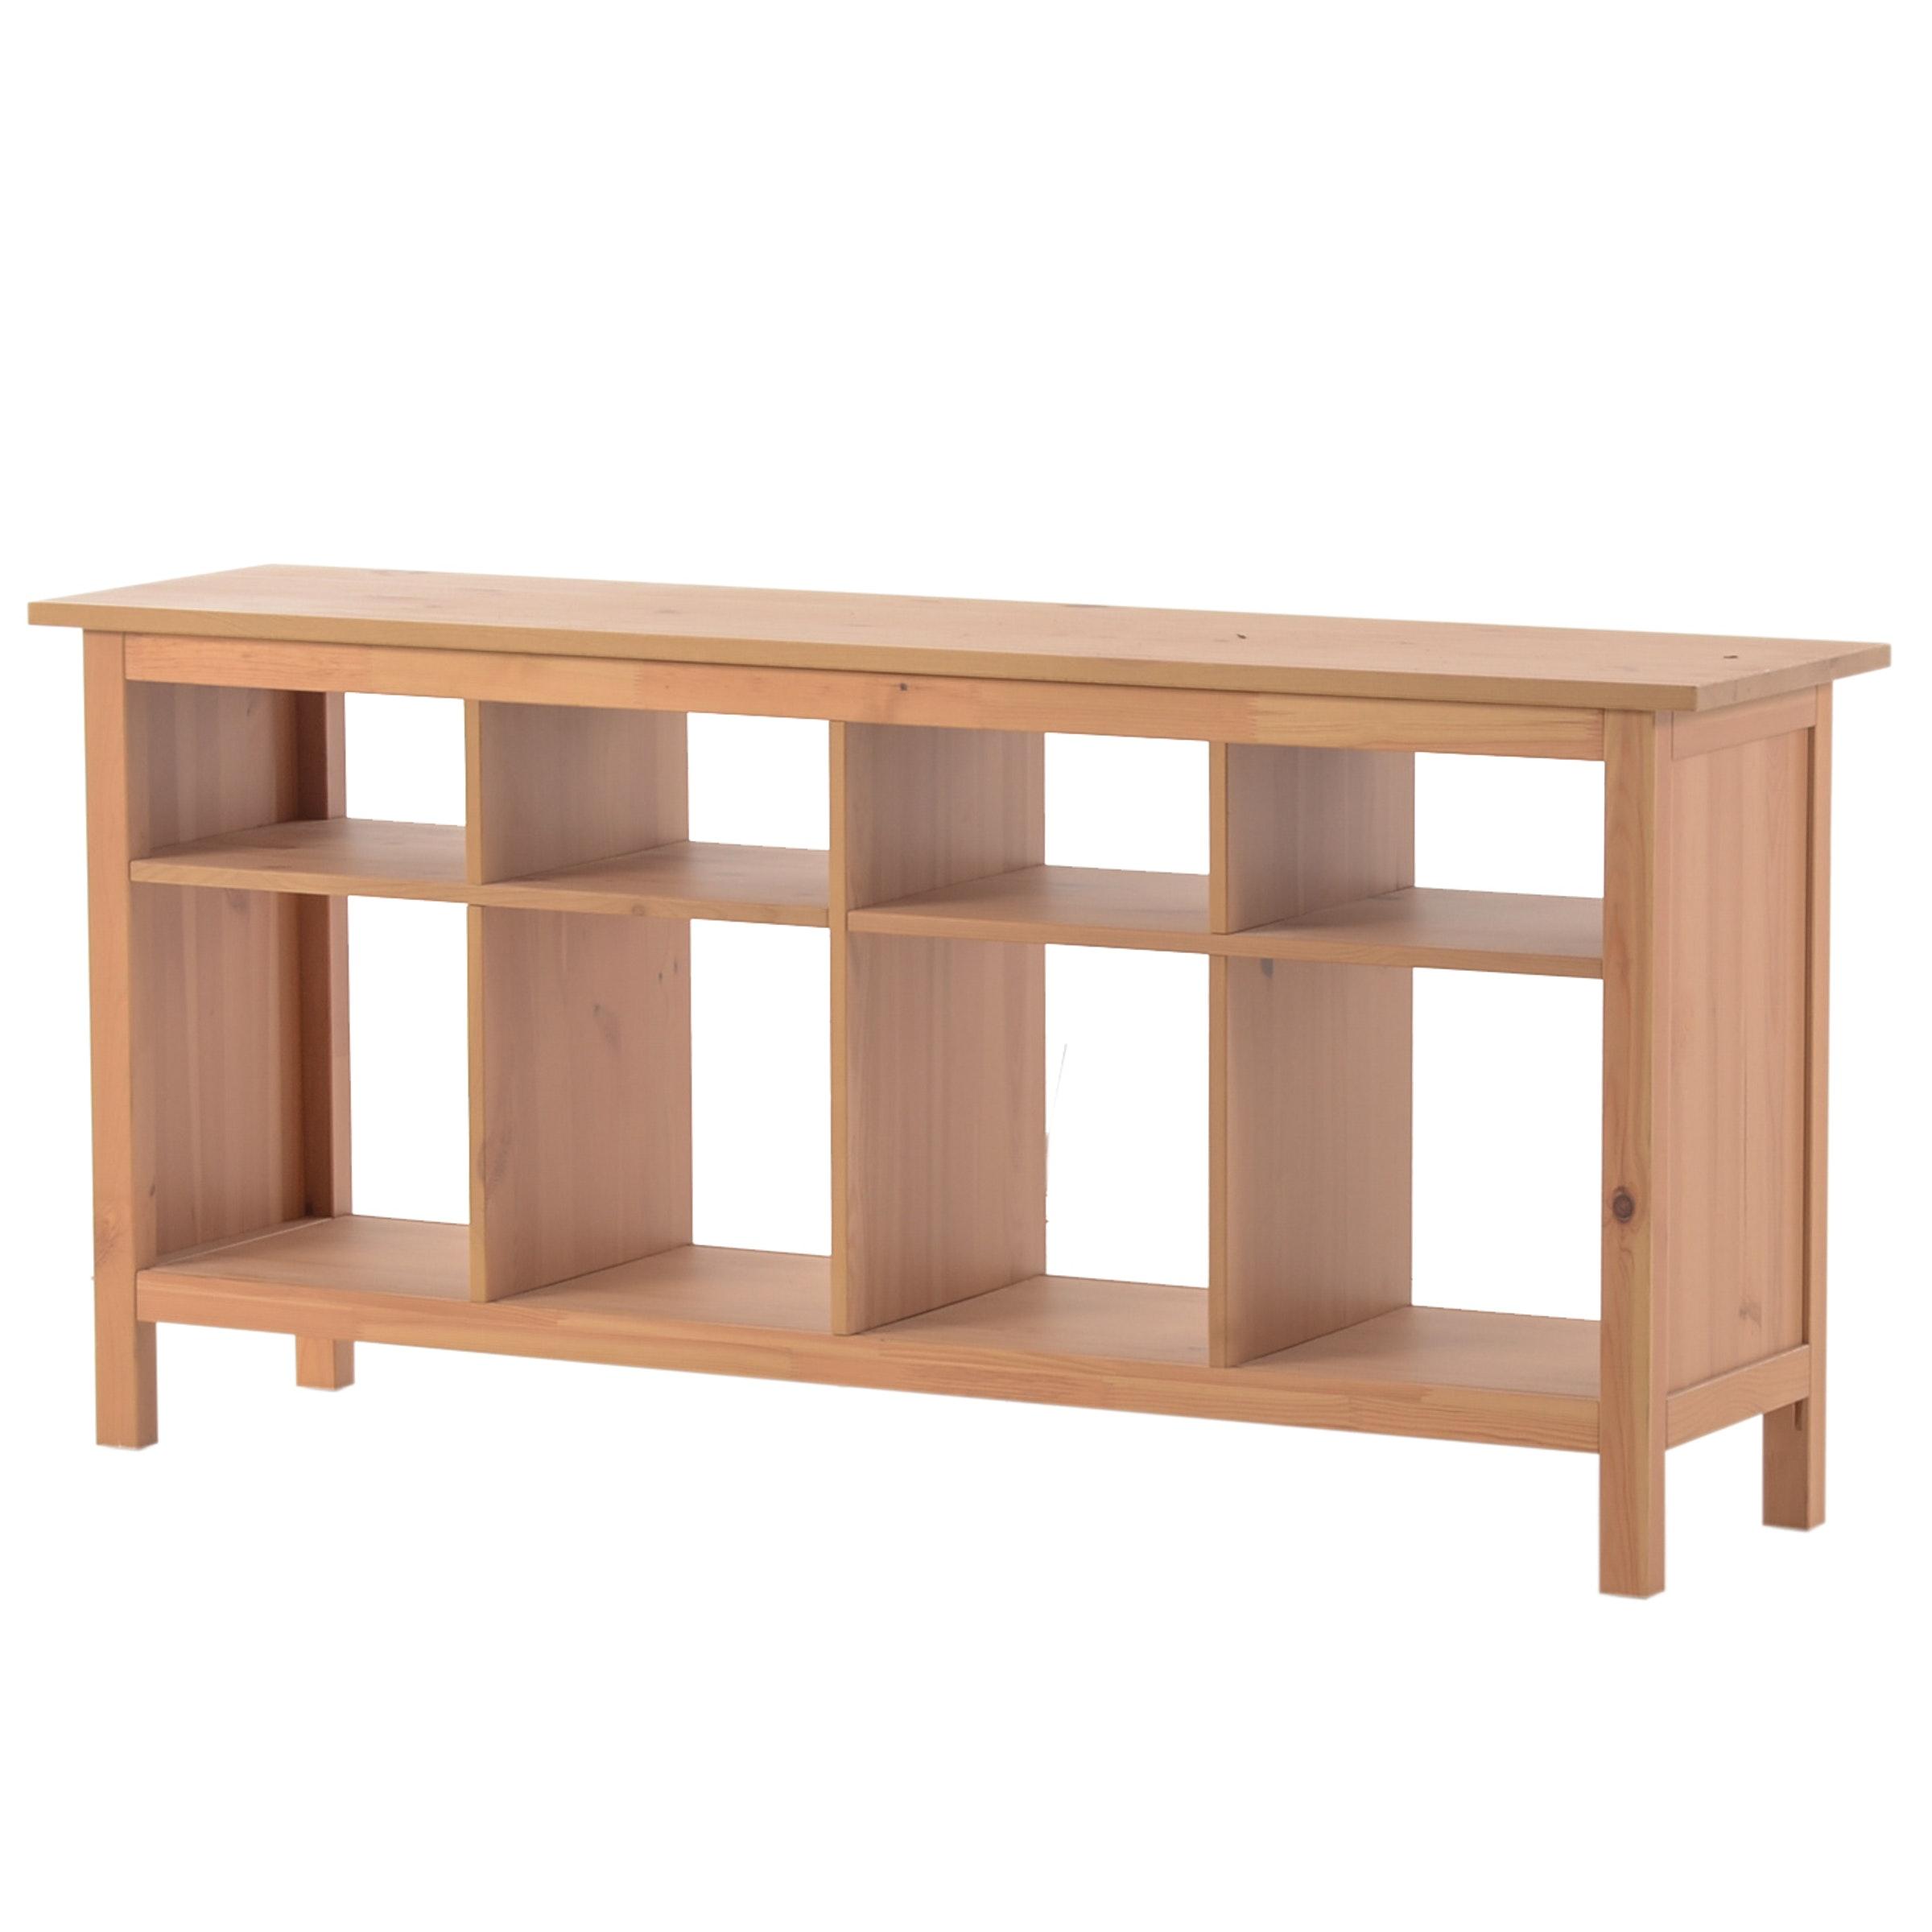 Pine Grained Laminate Shelf Unit